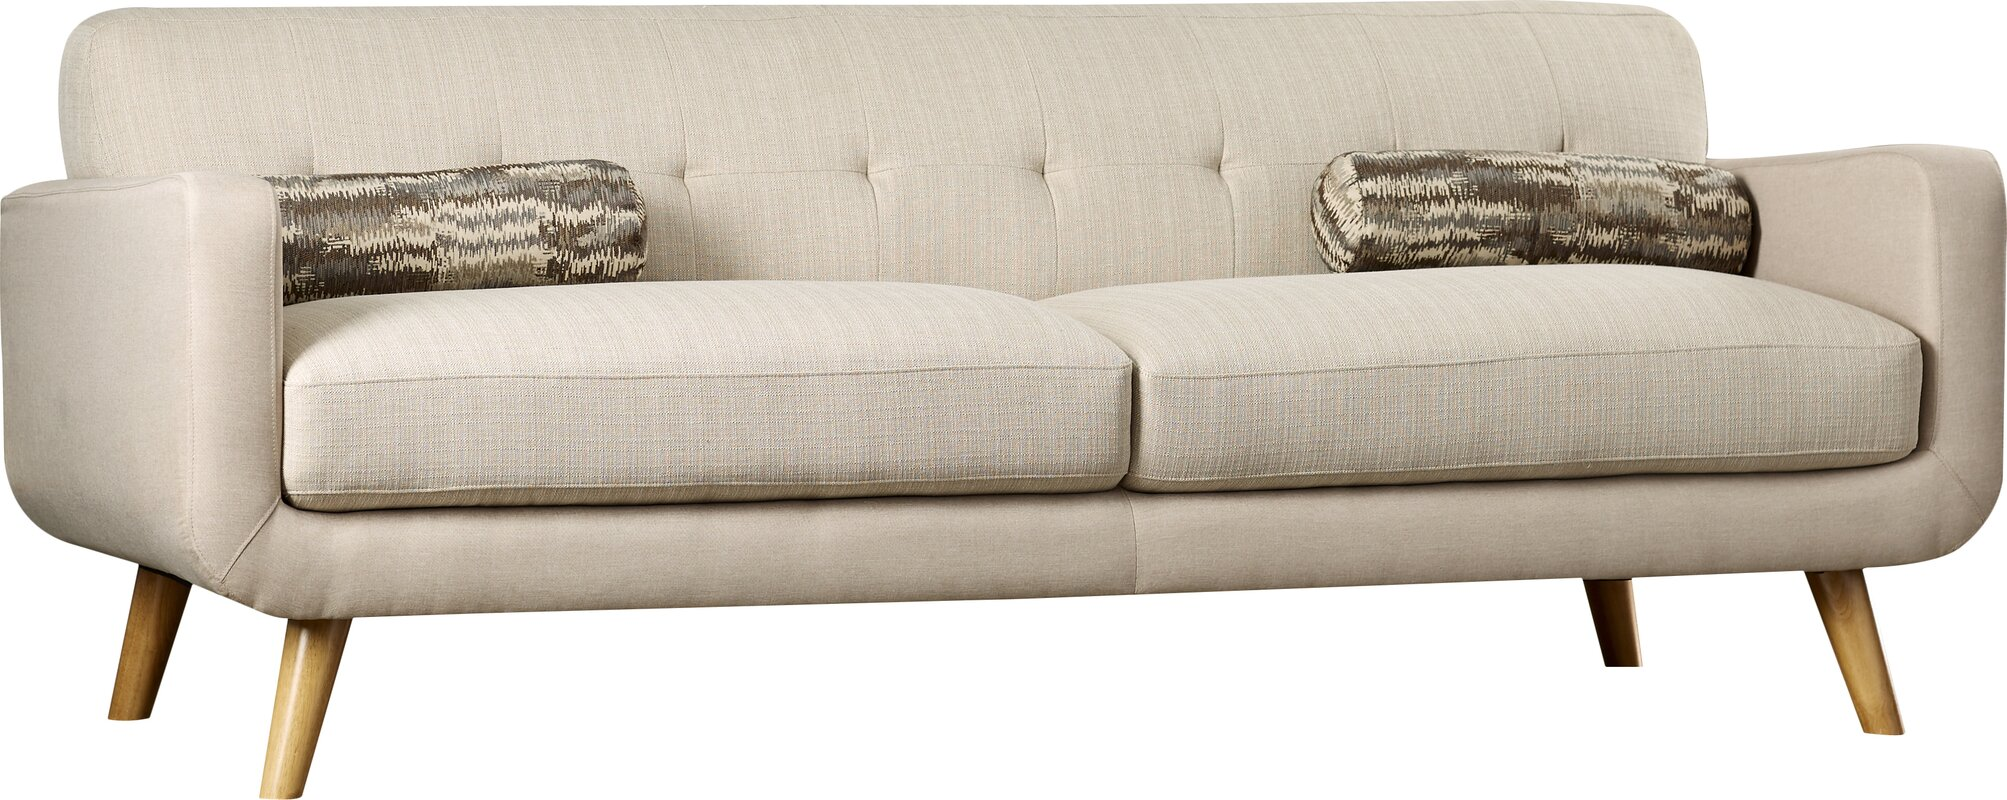 Mercury Row Phoebe Tufted Sofa & Reviews | Wayfair